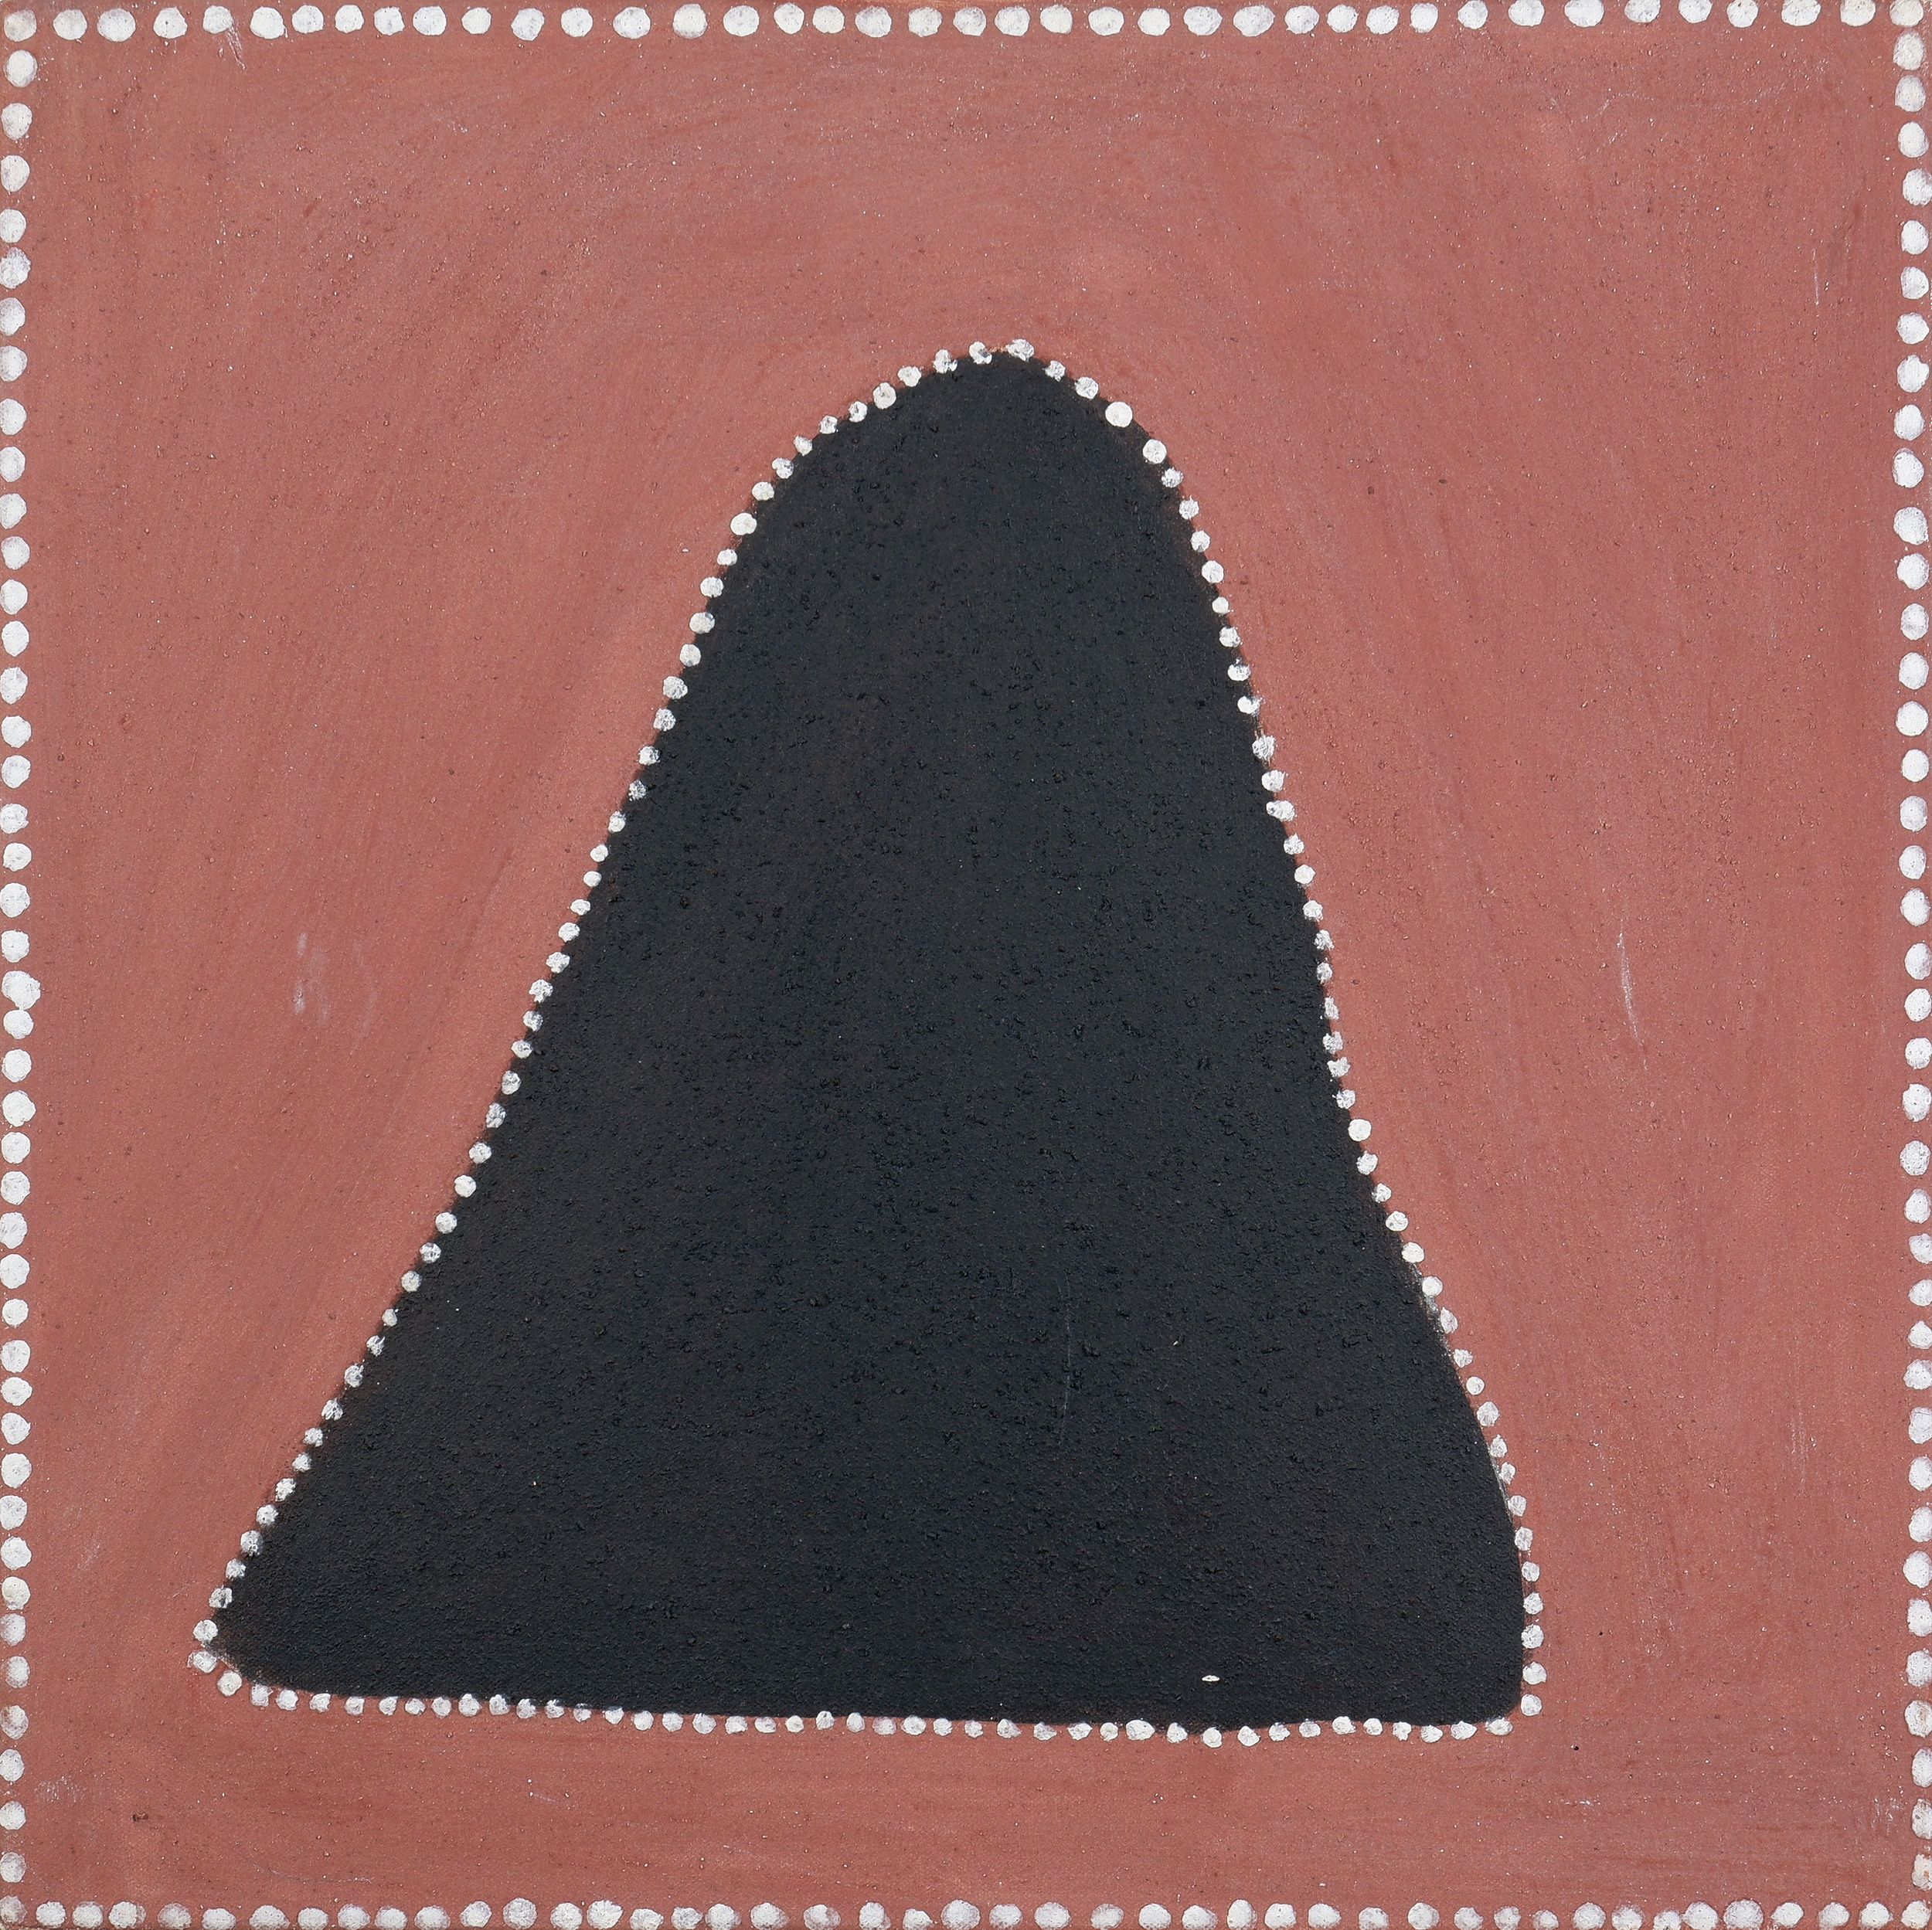 'Gordon Barney (born 1944, Gija language group), Goorlowliy, Natural Ochre and Pigments on Canvas, 45 x 45 cm'